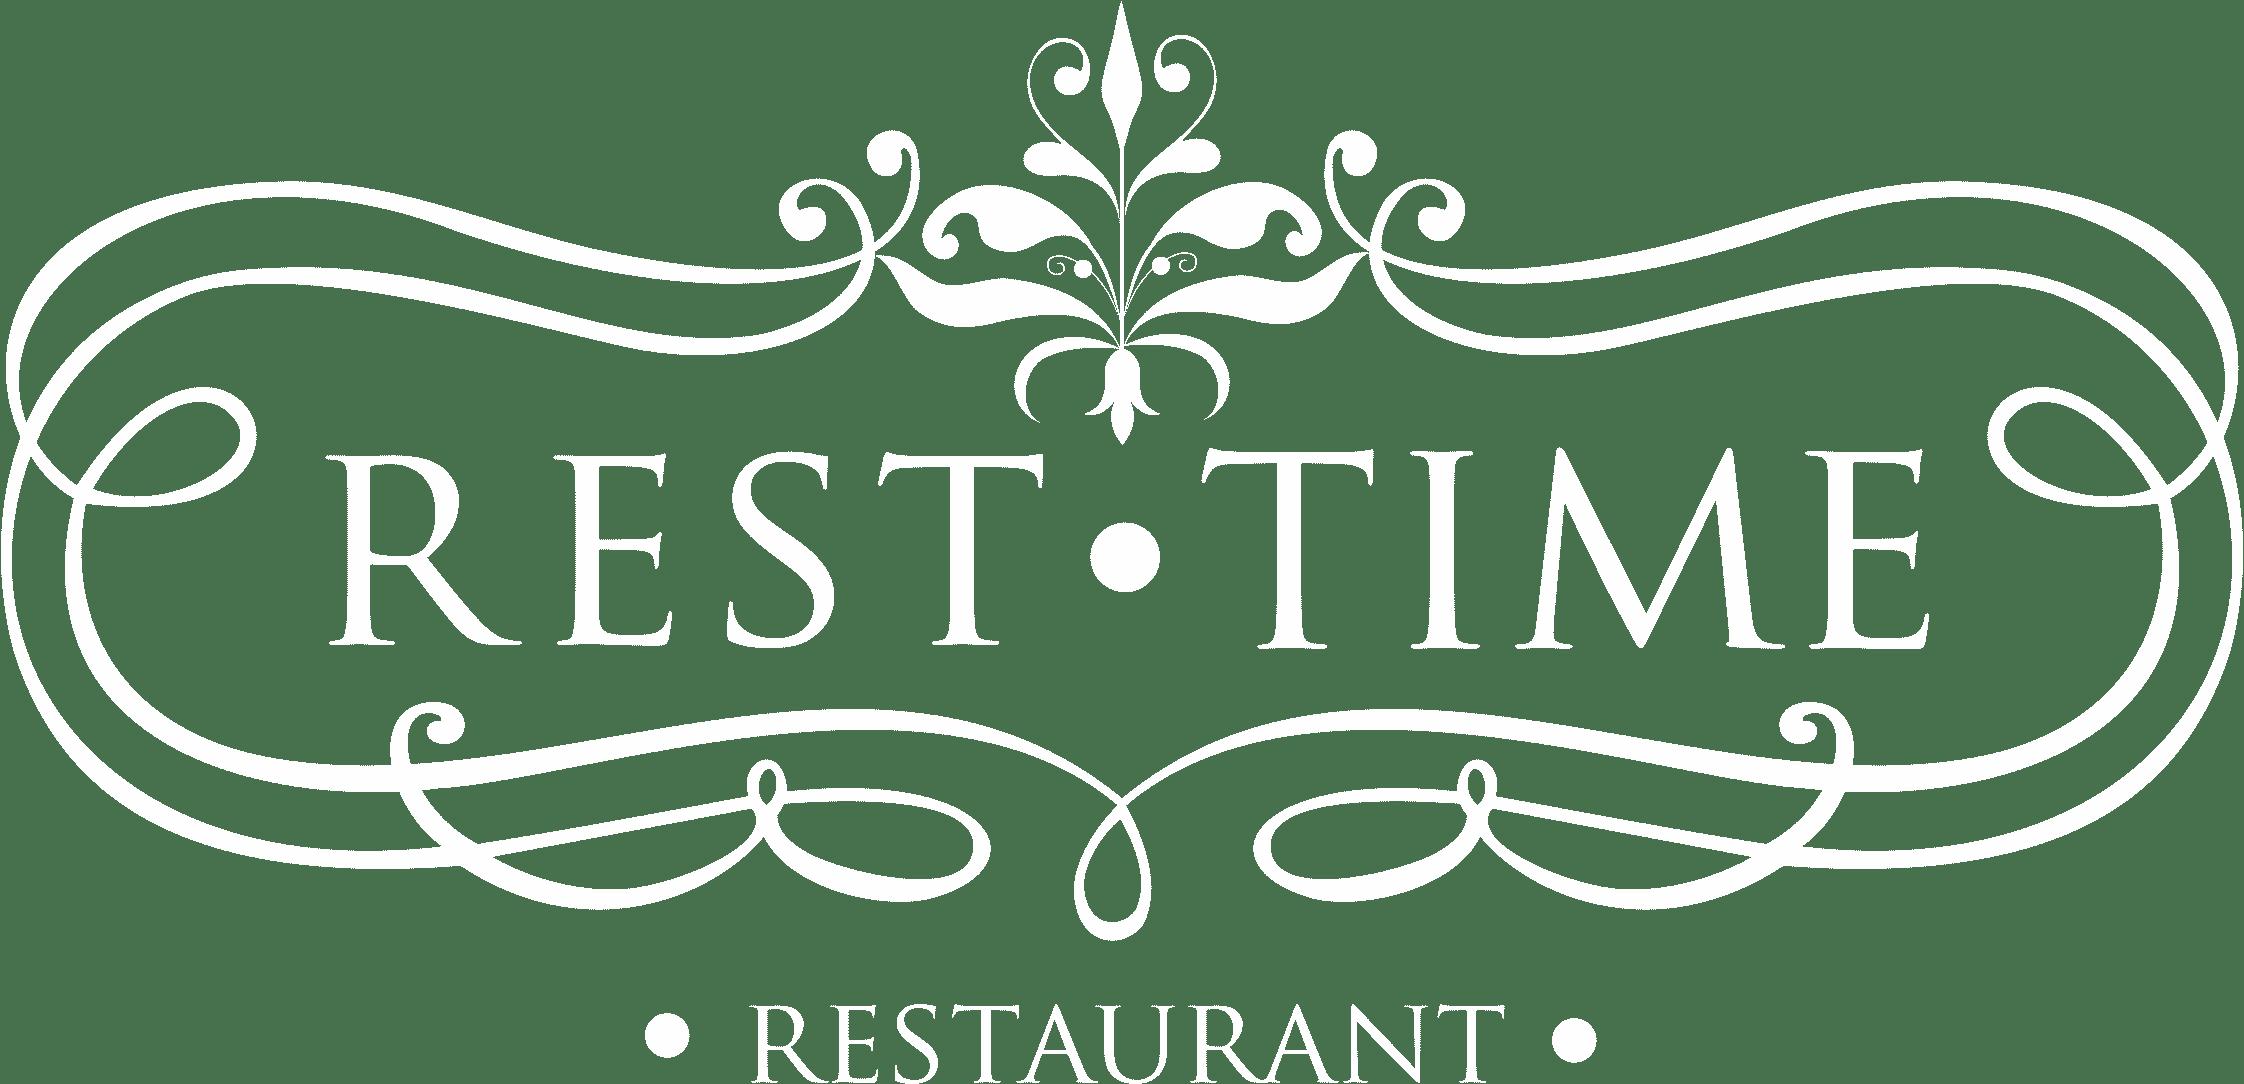 Банкеты под ключ в Уфе - ресторан Rest-Time (Рест-Тайм)